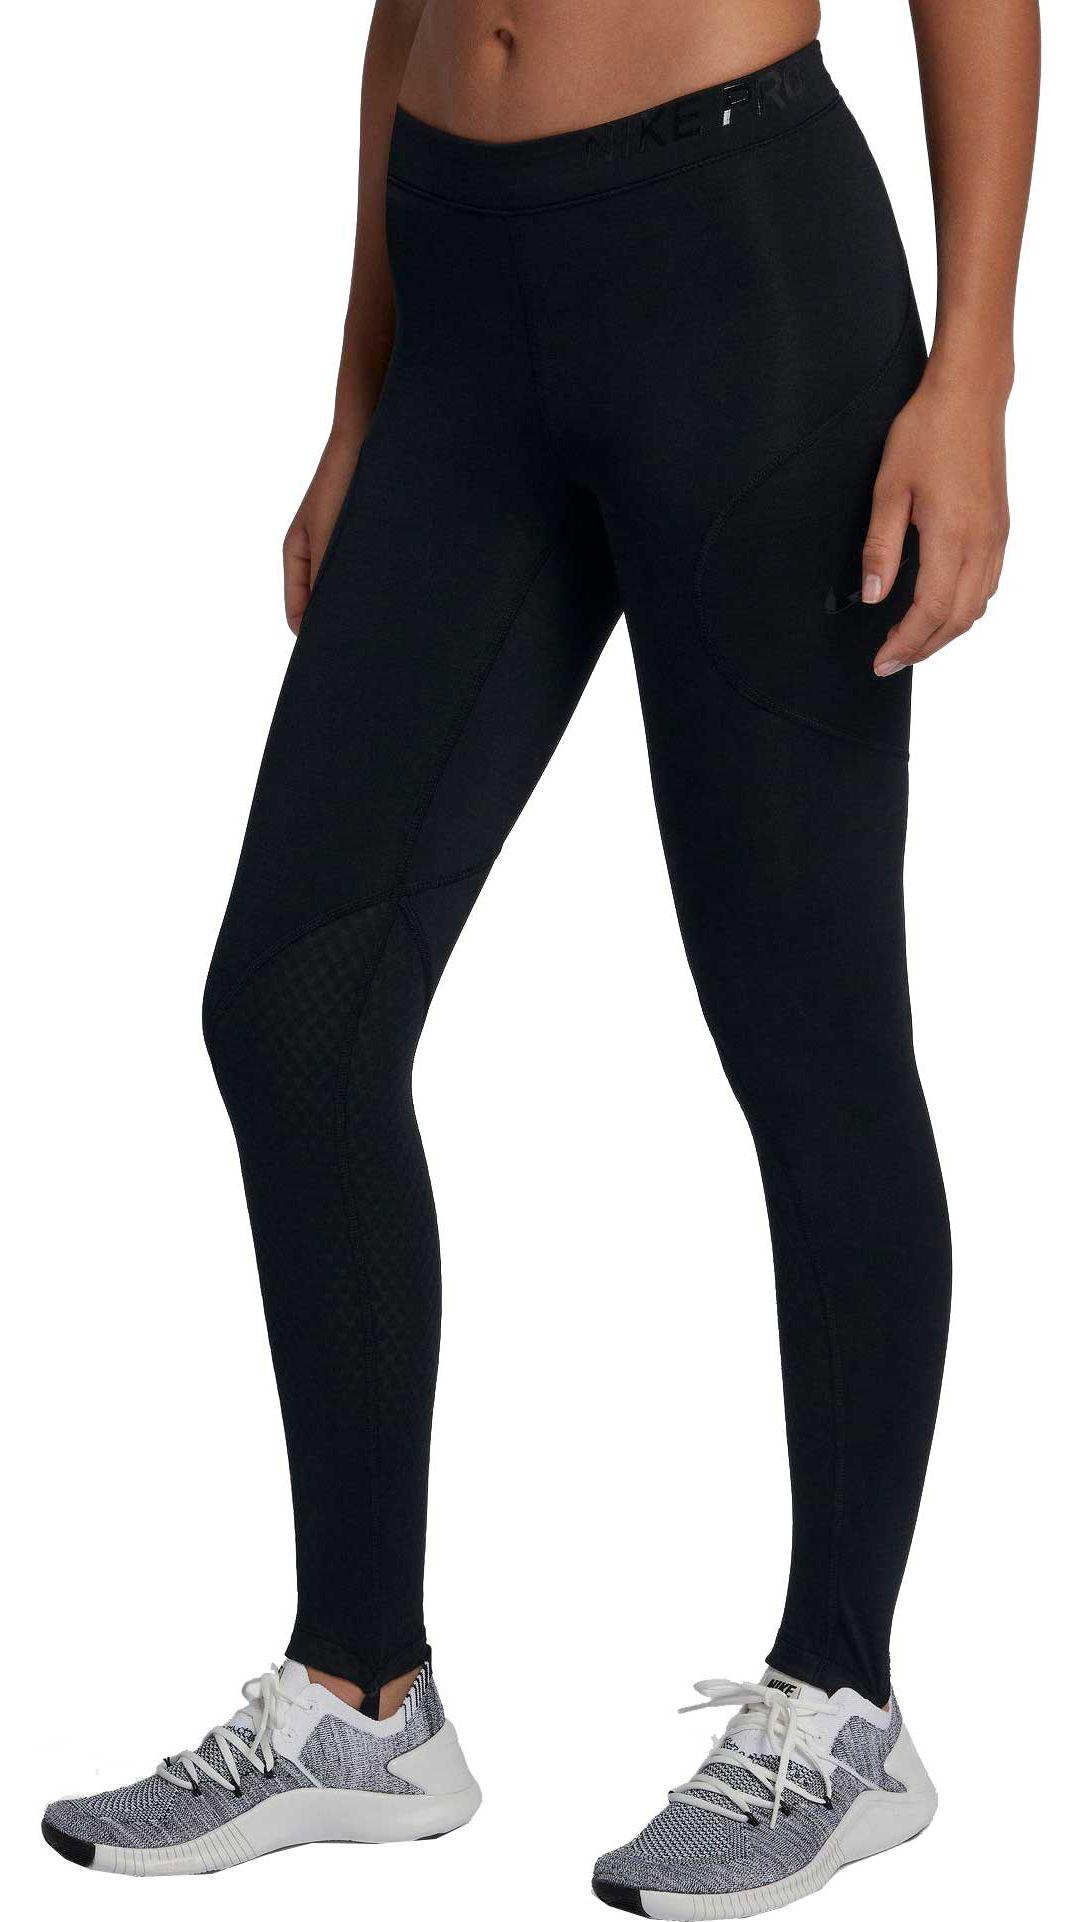 6e7dd53d13 Nike Women's Pro HyperWarm Training Tights | DICK'S Sporting Goods